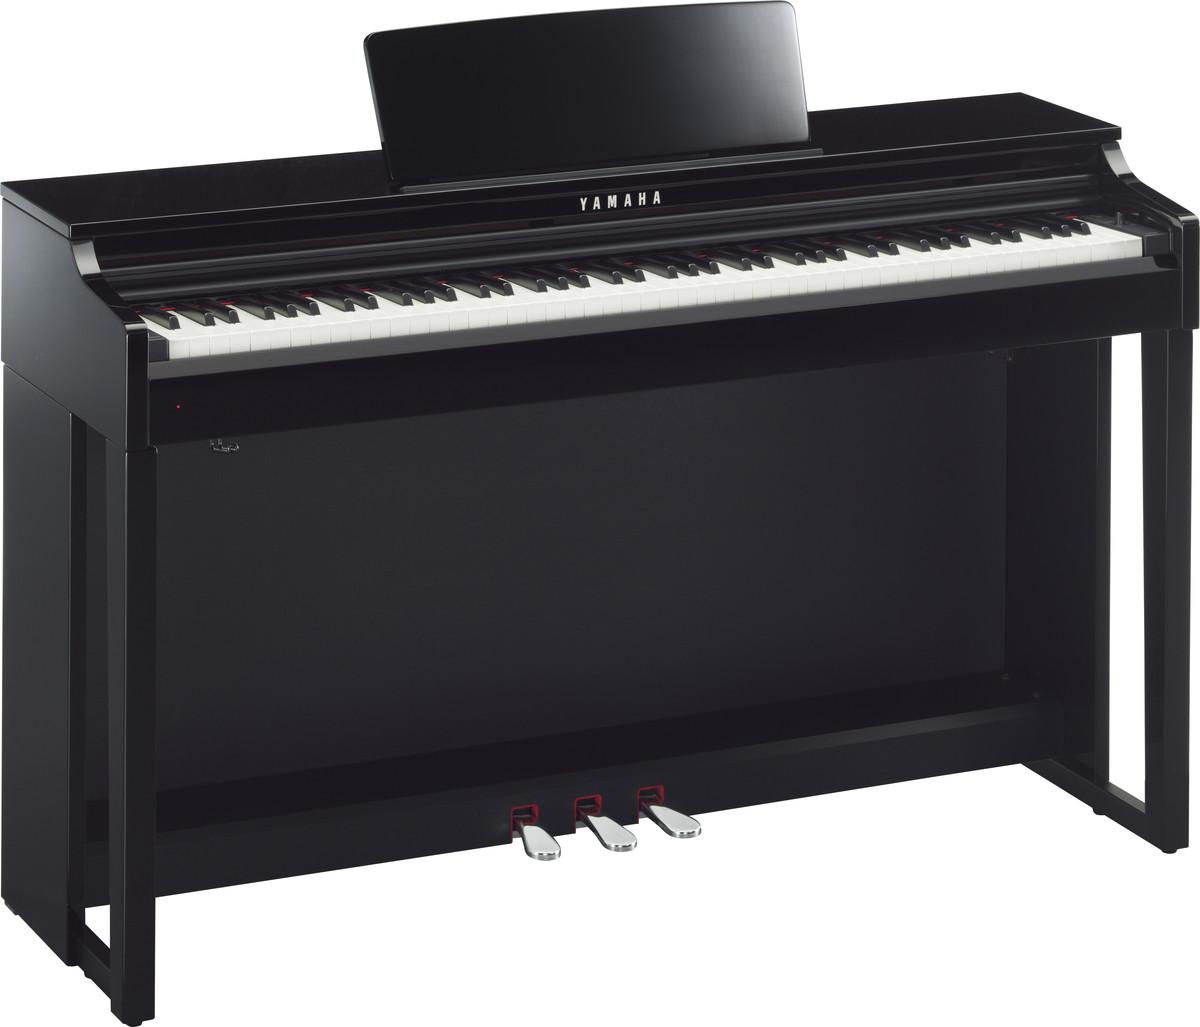 Yamaha clavinova clp525 digital piano polished ebony at for Yamaha digital piano clavinova